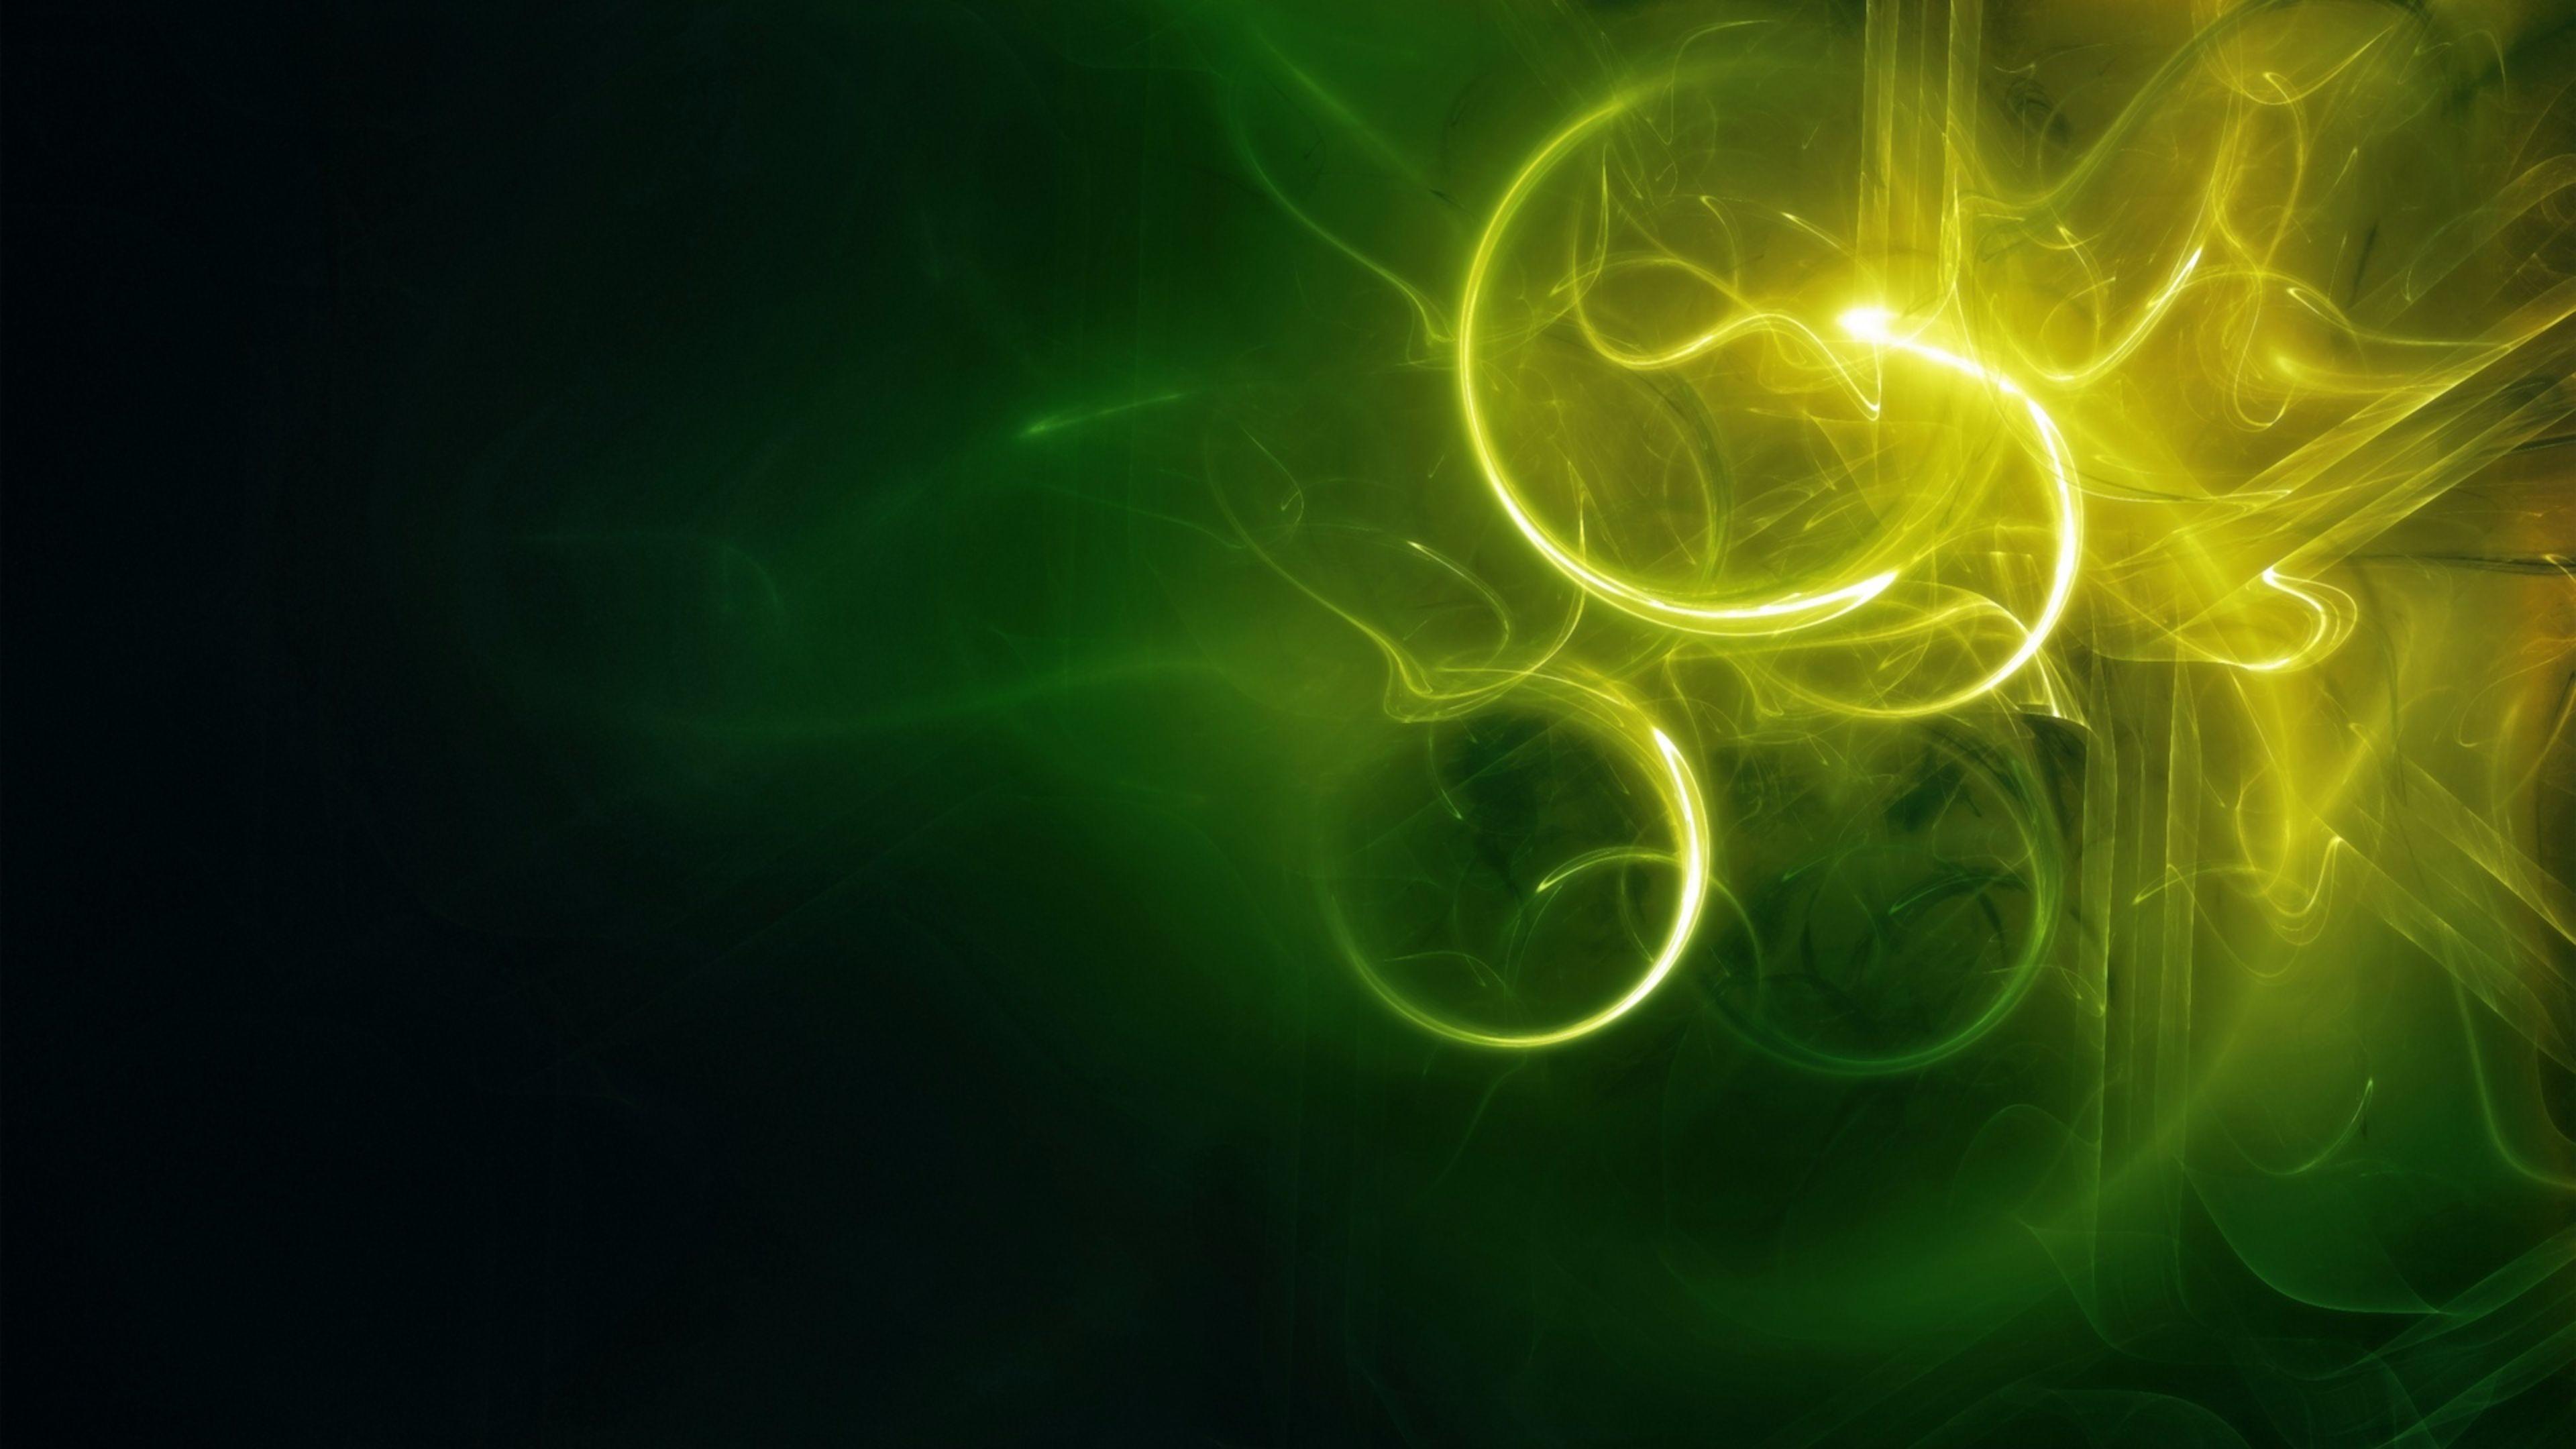 Shades of Green 4K Abstract Wallpapers